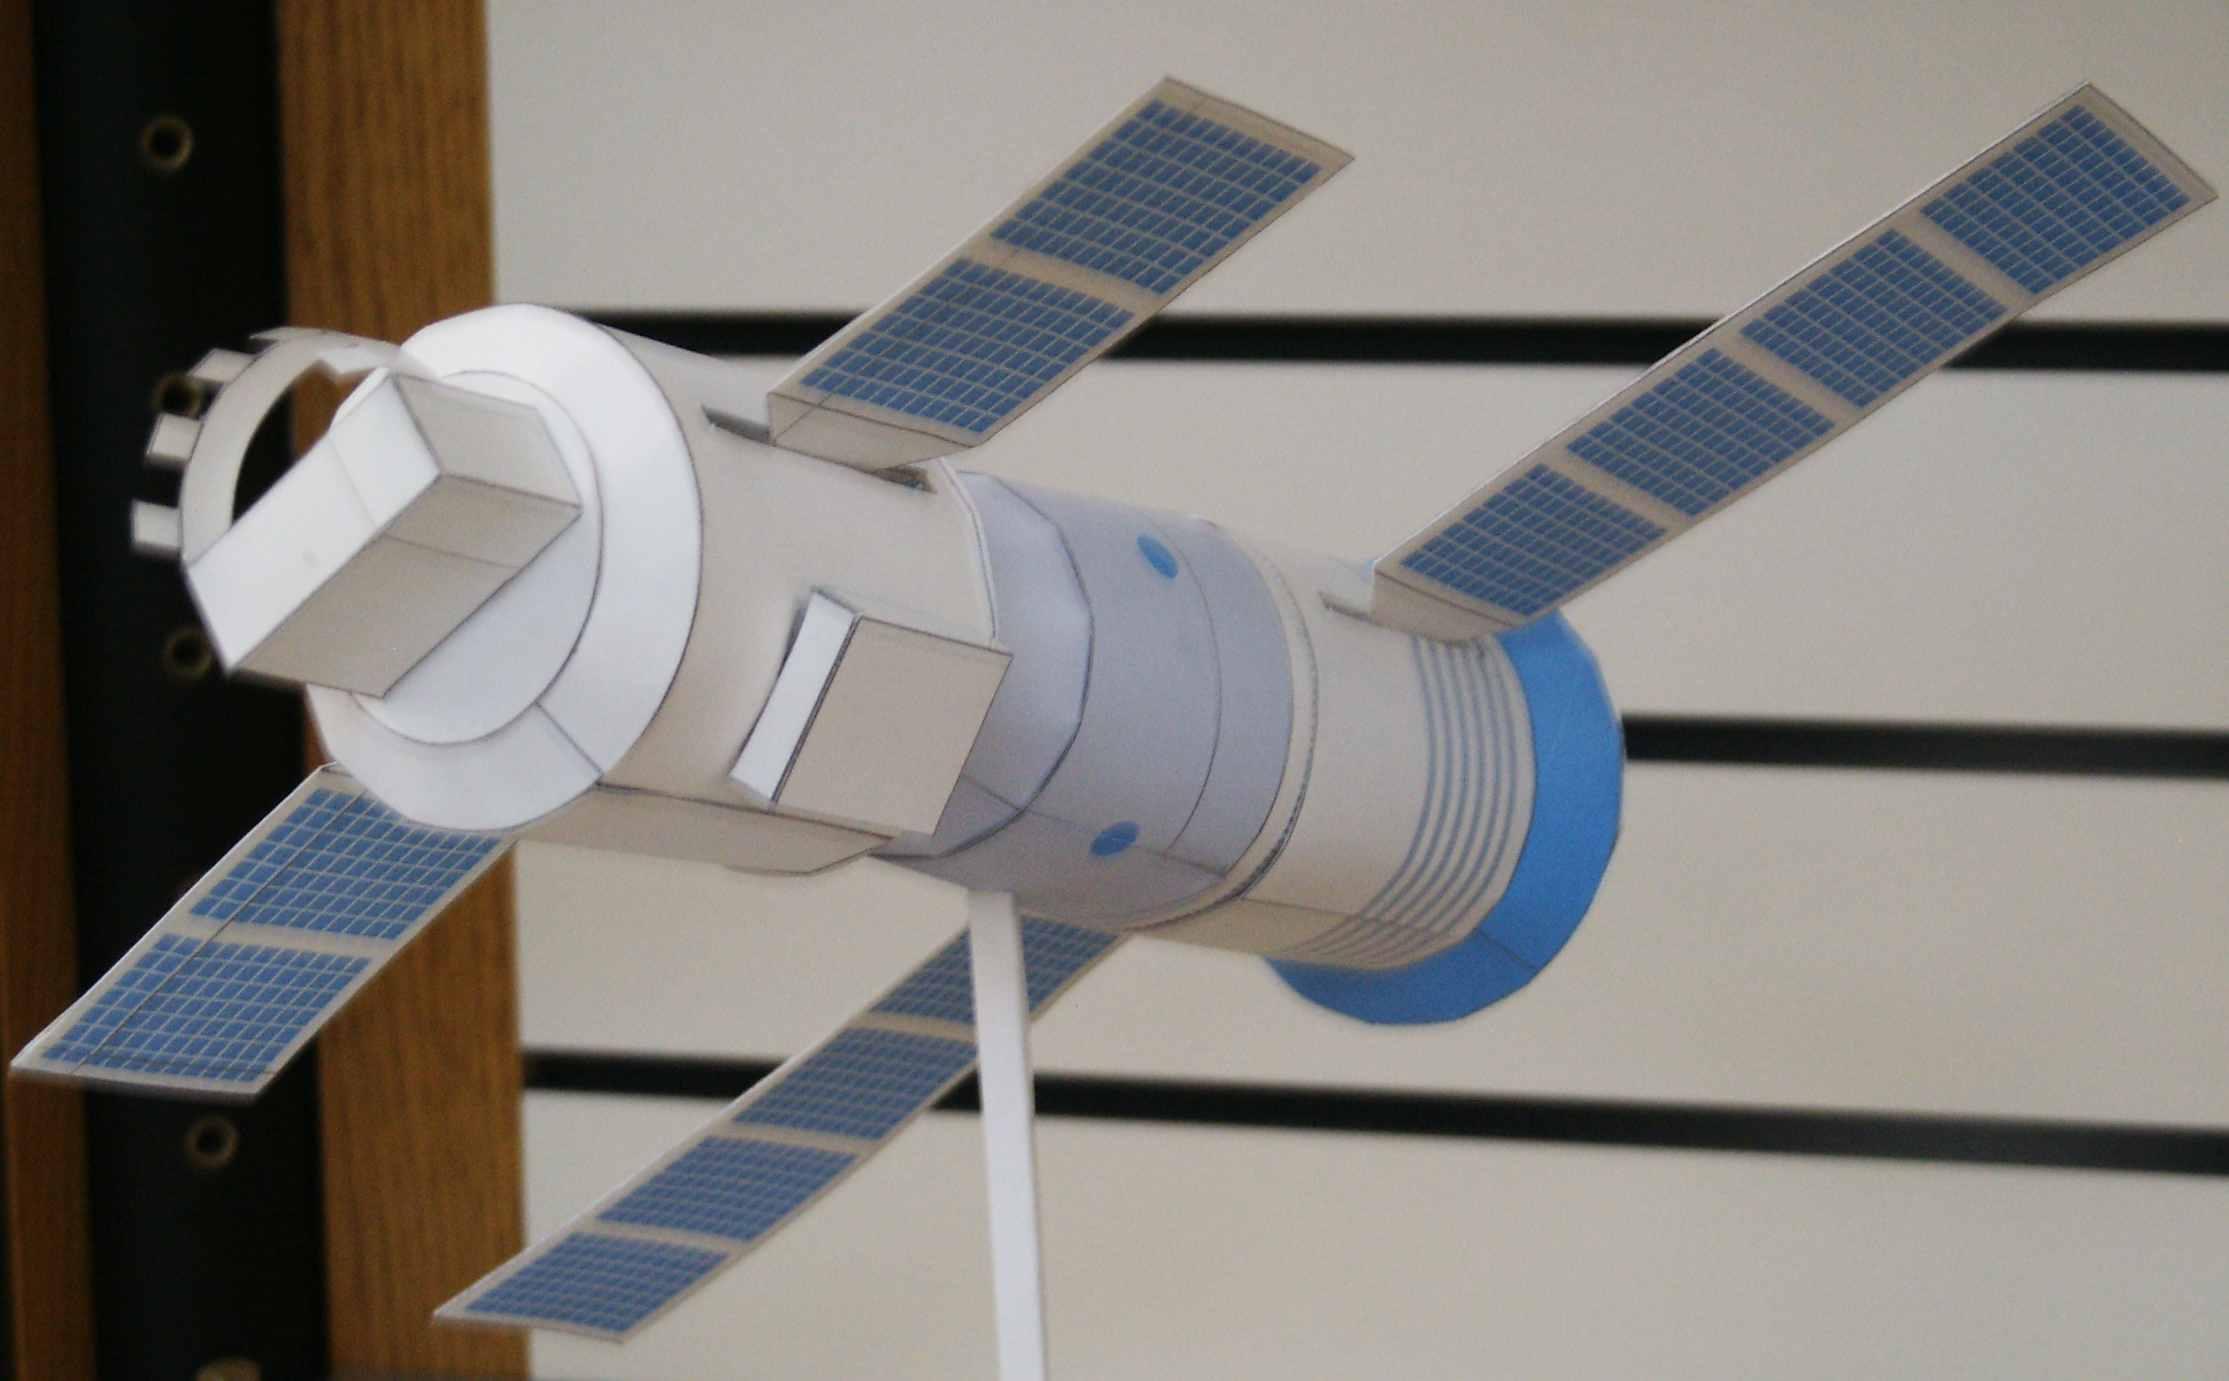 paper spacecraft models - photo #20